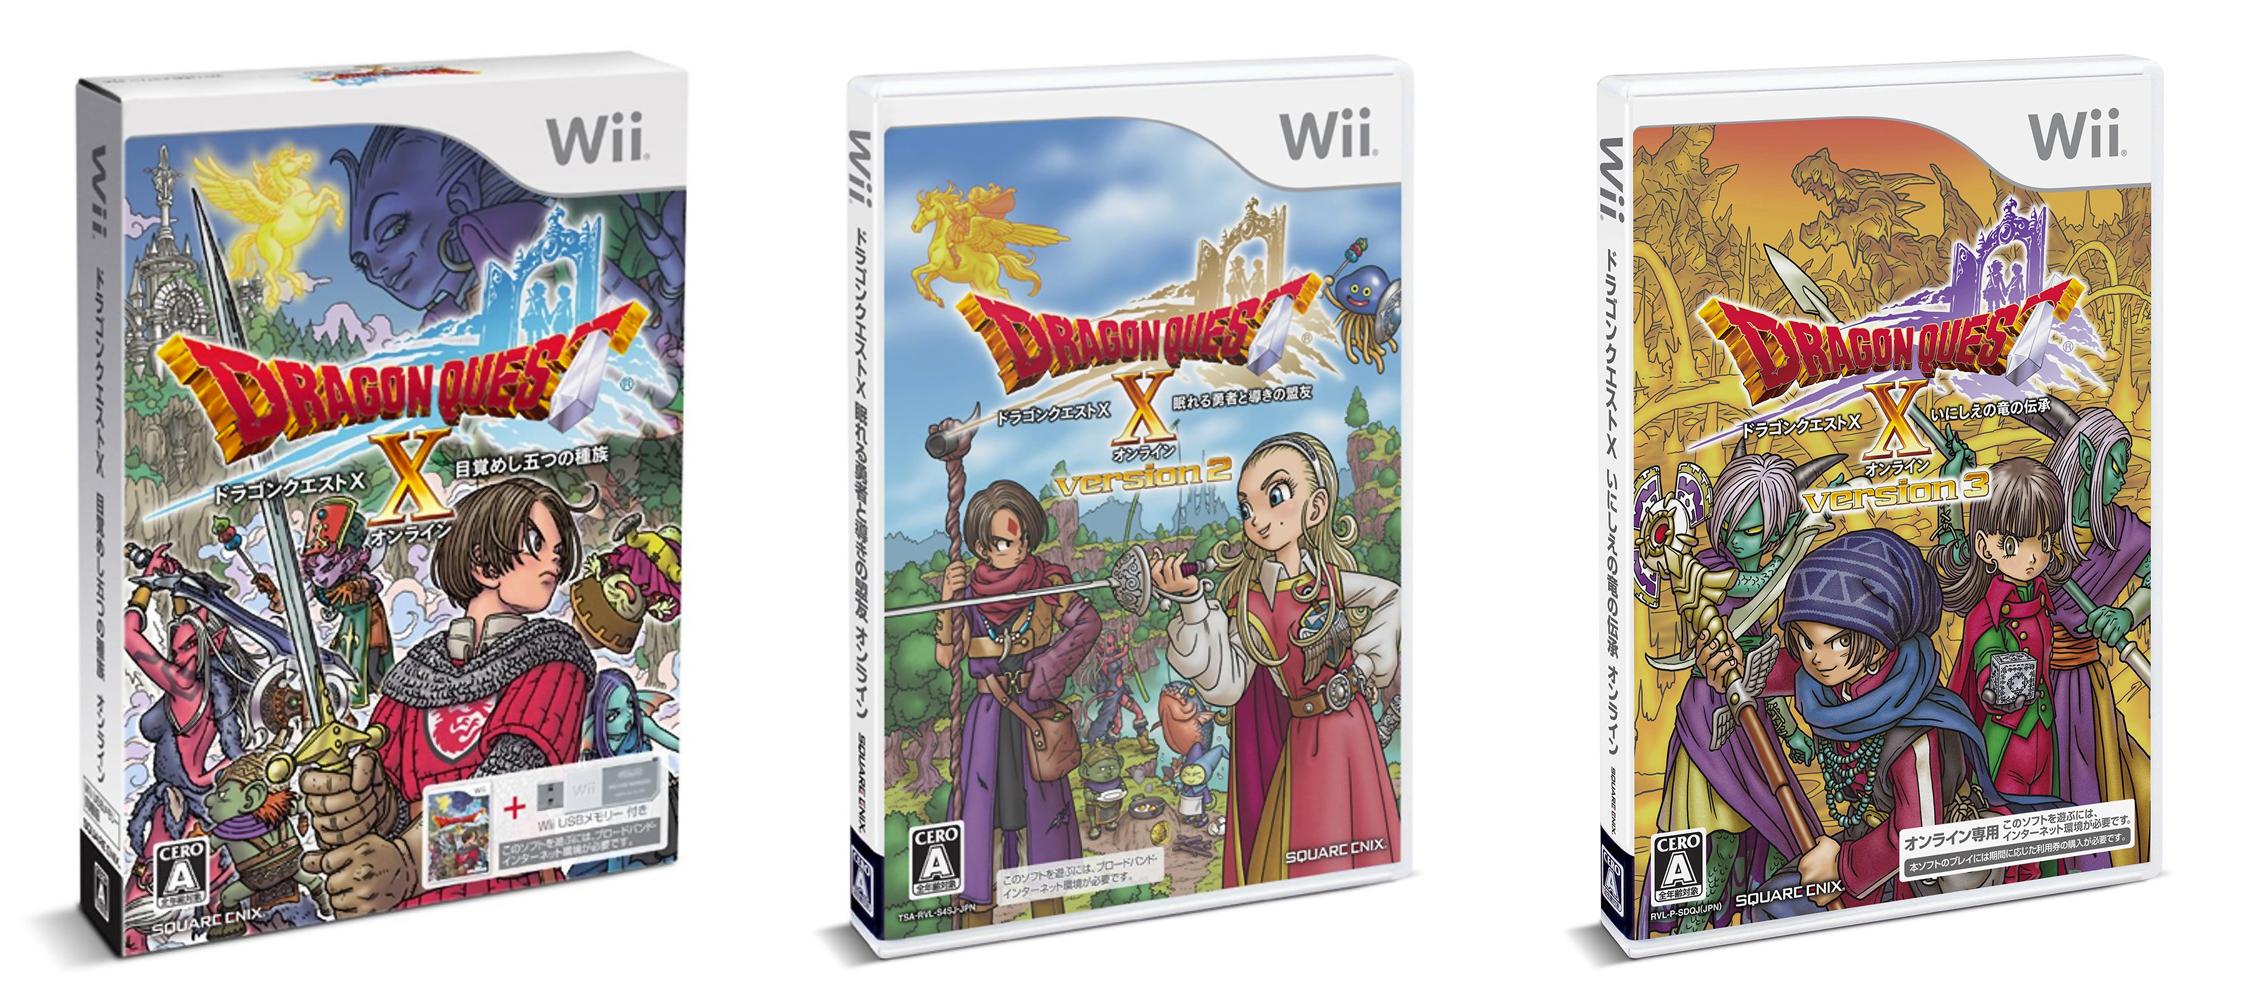 Dolphin Emulator - Emulating Dragon Quest X Online